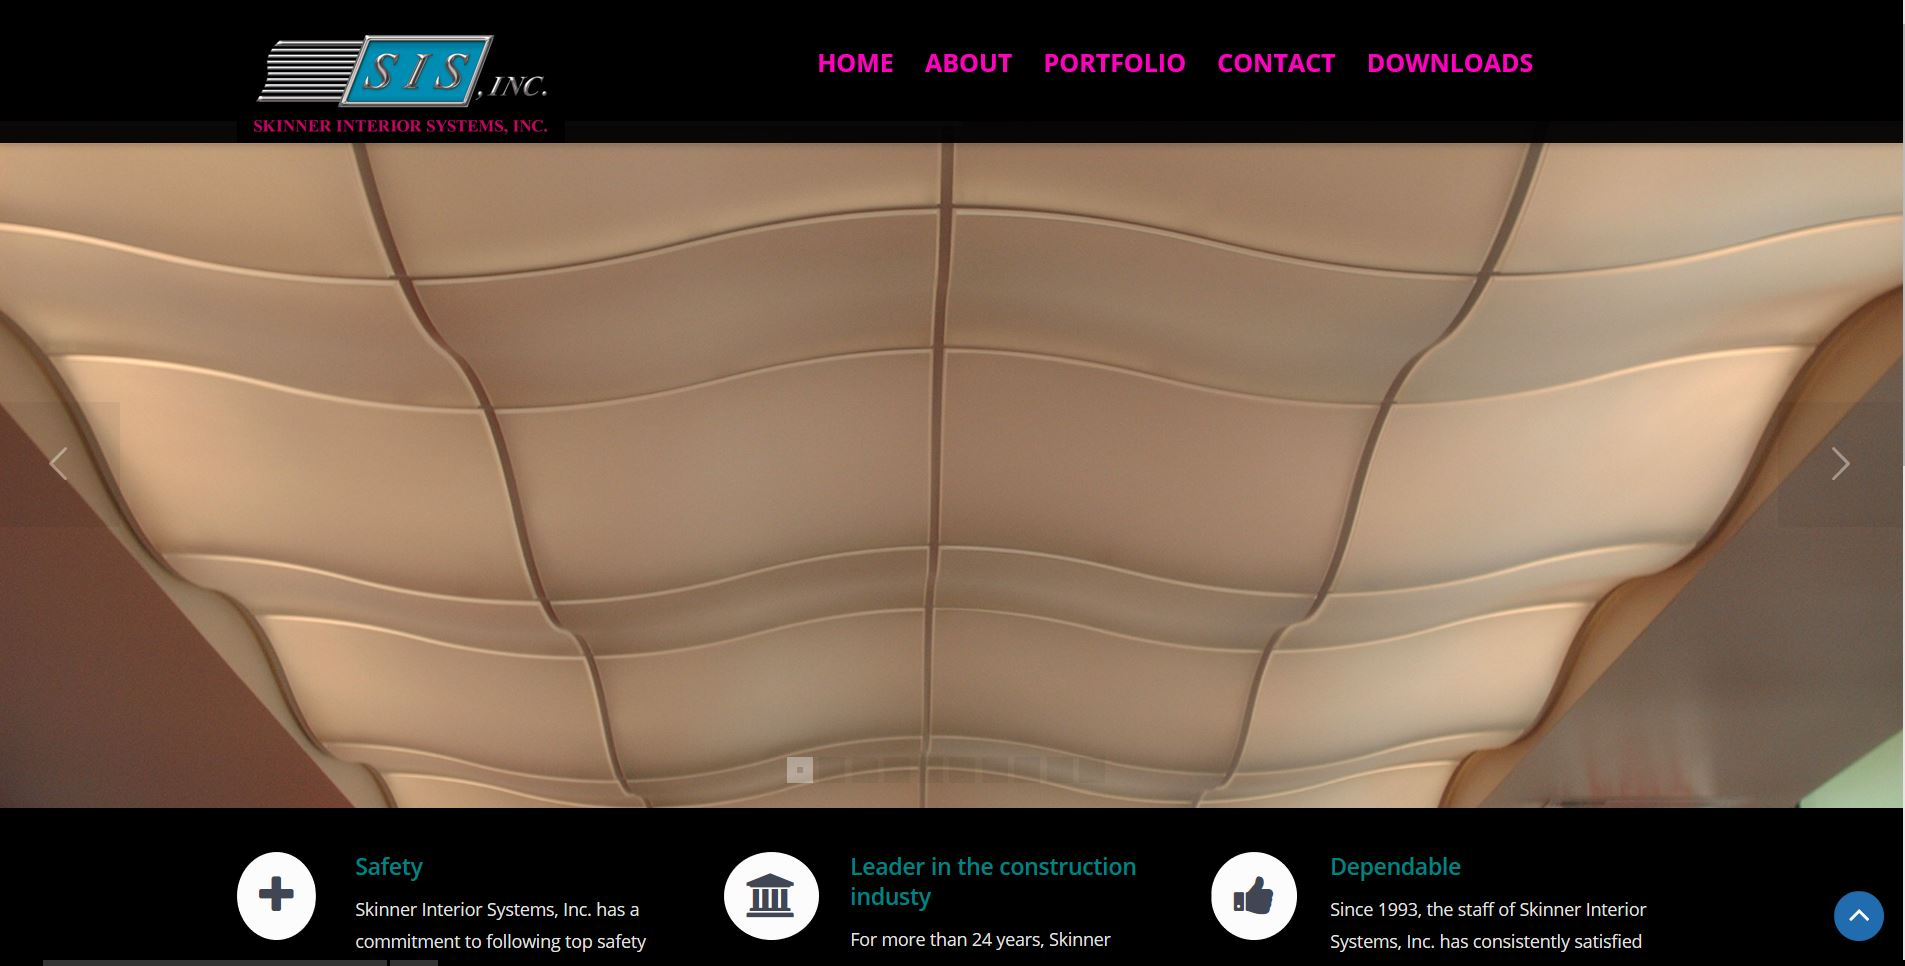 Skinner Interior Systems, Inc. New Website